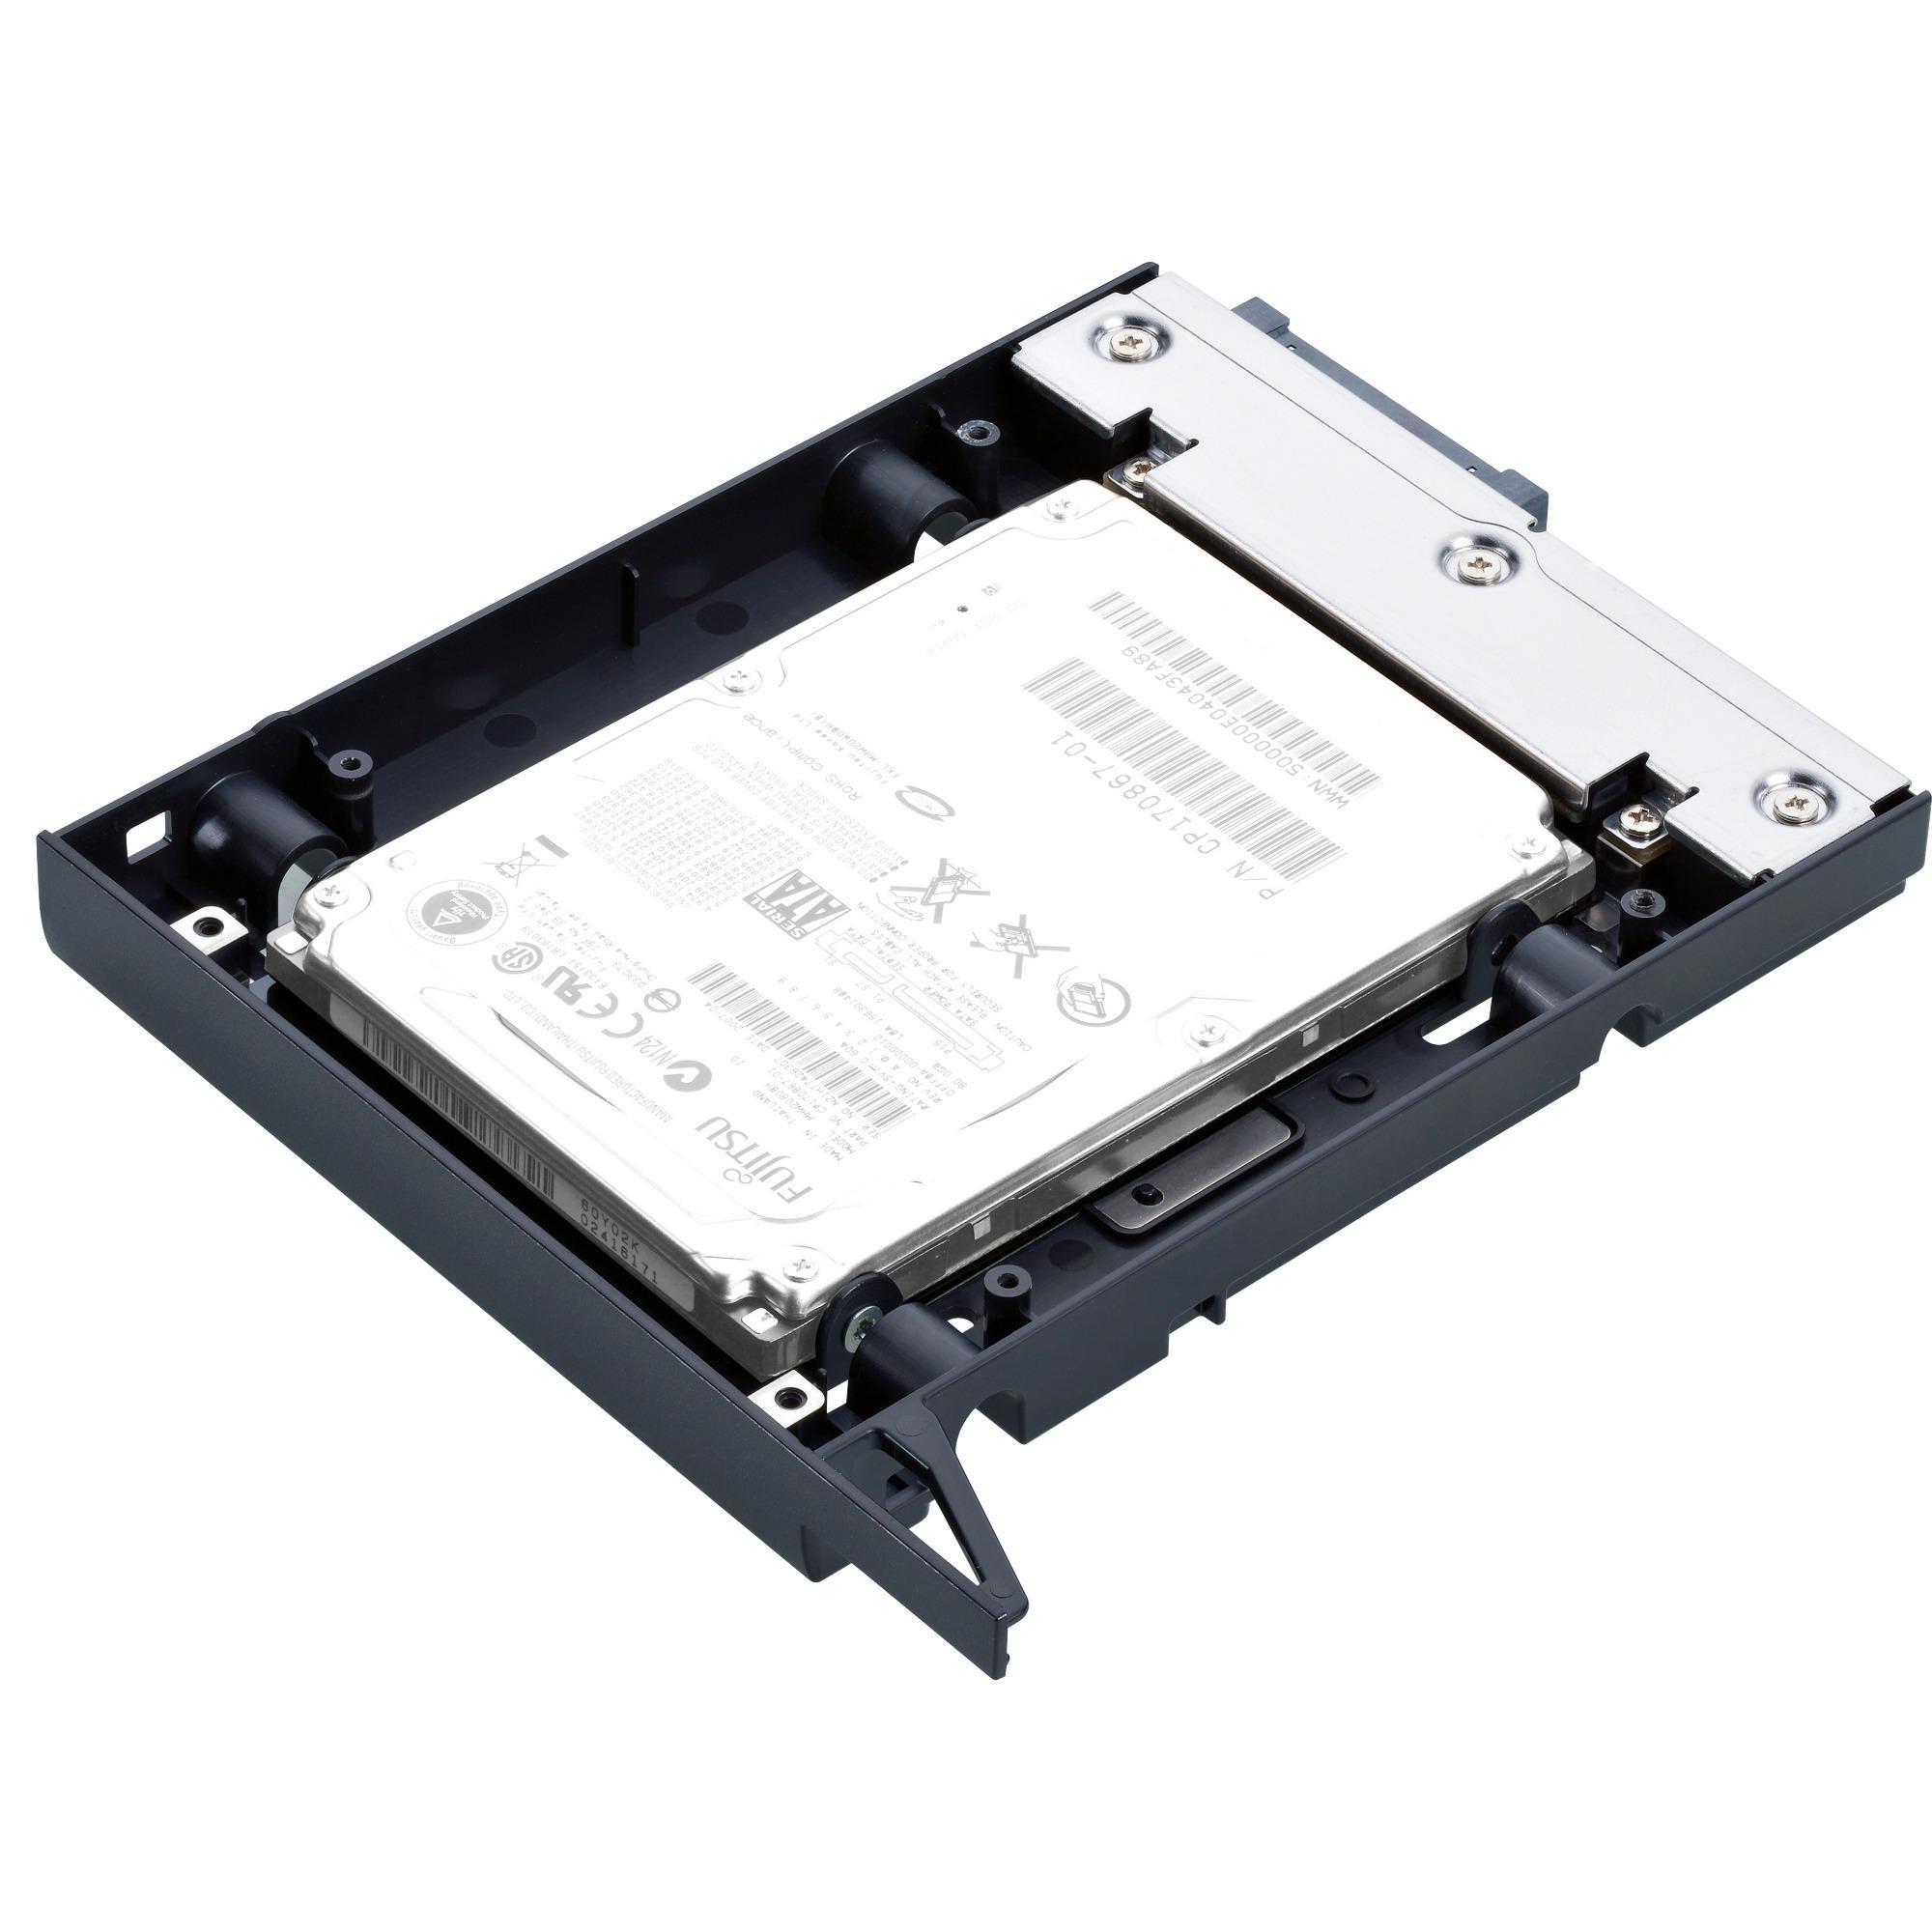 "2nd HDD bay 2.5"""" Carrier panel, Bastidor de instalación"